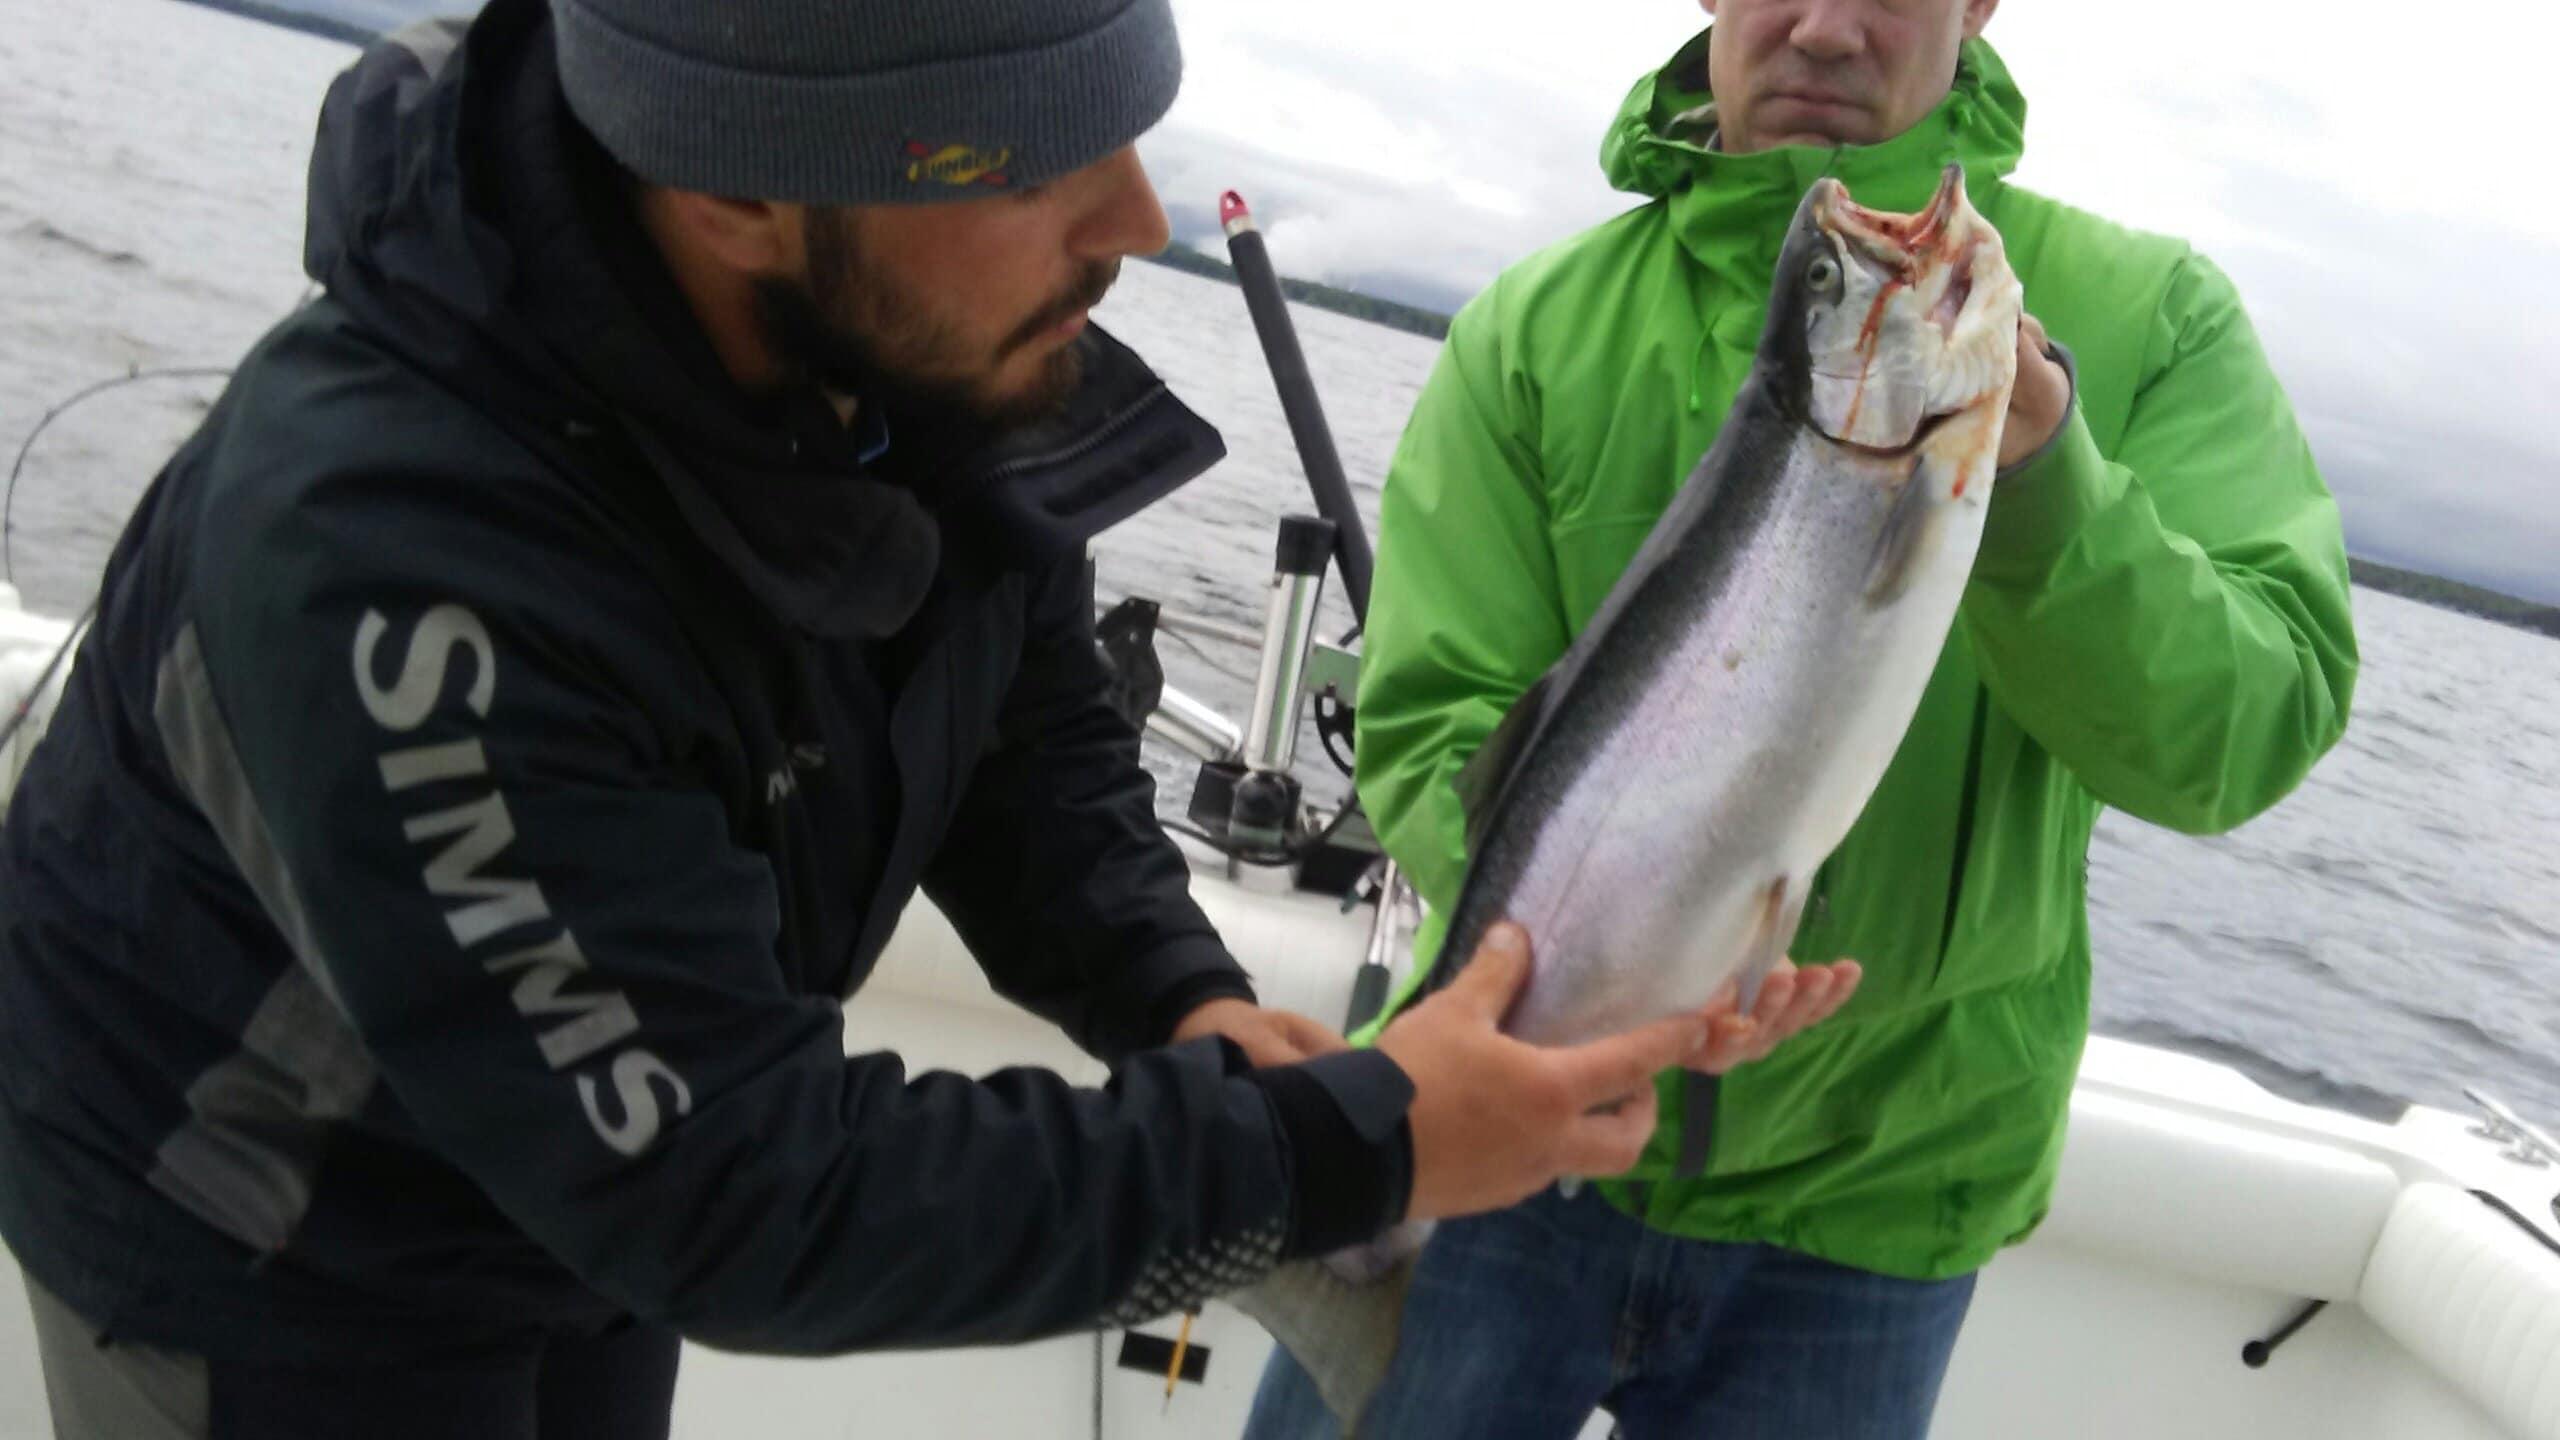 7 LB domestic rainbow trout